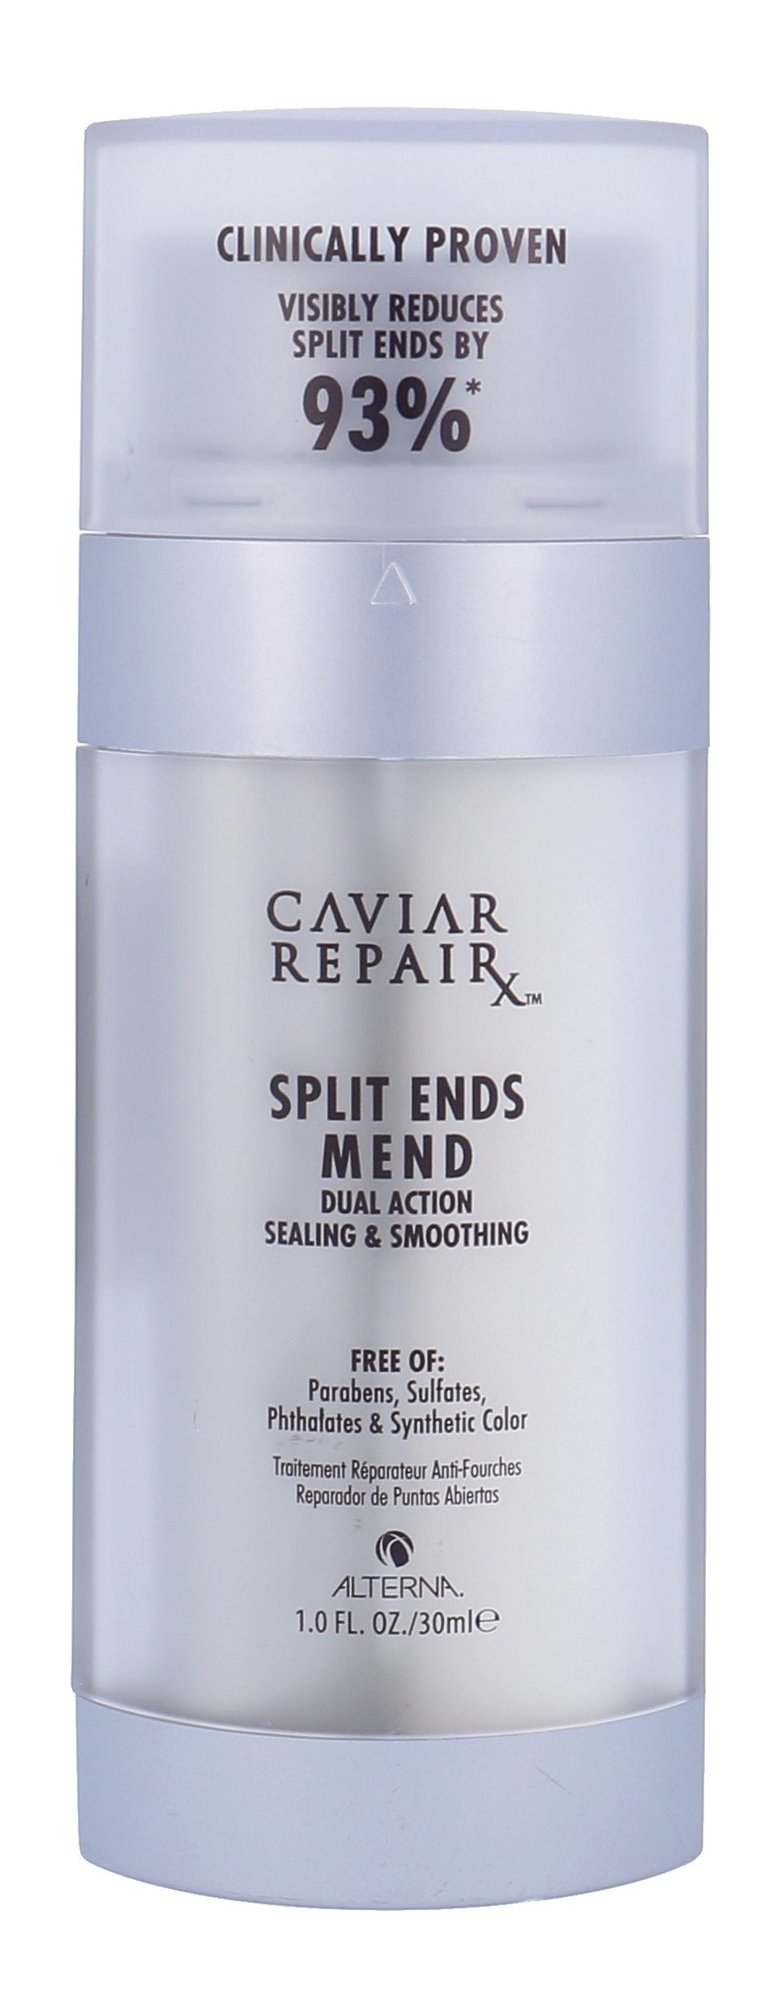 Alterna Caviar Repairx Split Ends Mend Cosmetic 30ml